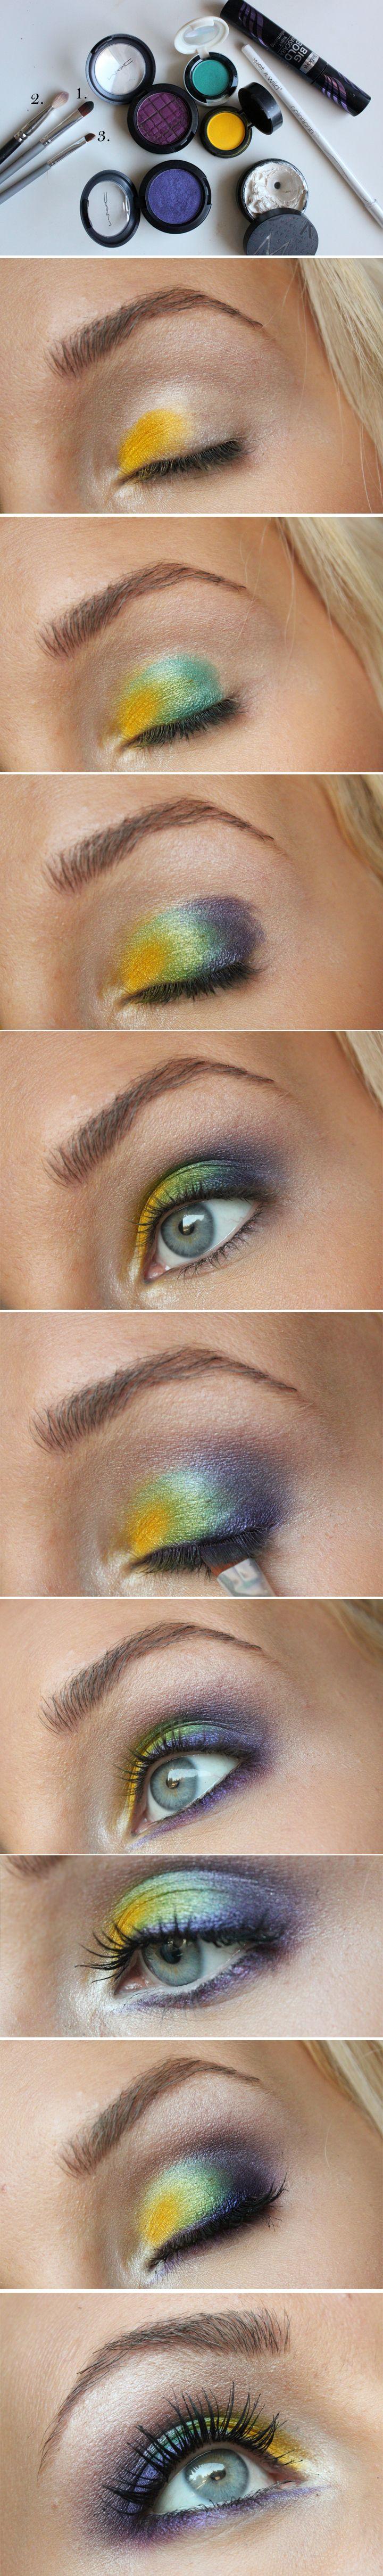 Helen Torsgården - colored eyeshadow: Blogger Helen, Makeup Tutorials, Peacock Eyeshadow, Hair Style, Colored Eyeshadow